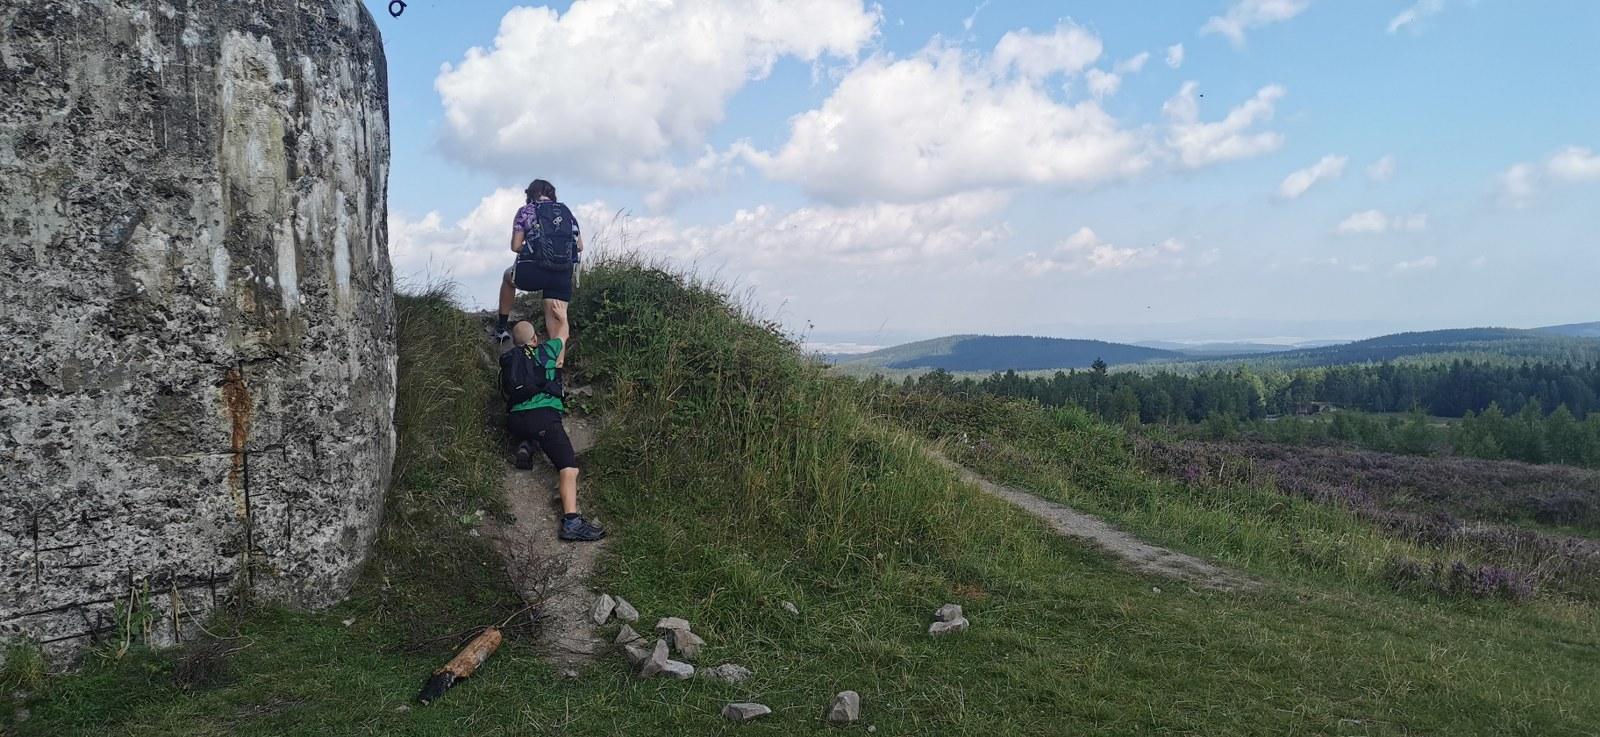 https://www.kempy-chaty.cz/sites/default/files/turistika/batoh_r2_trail_star_1600x737.jpg